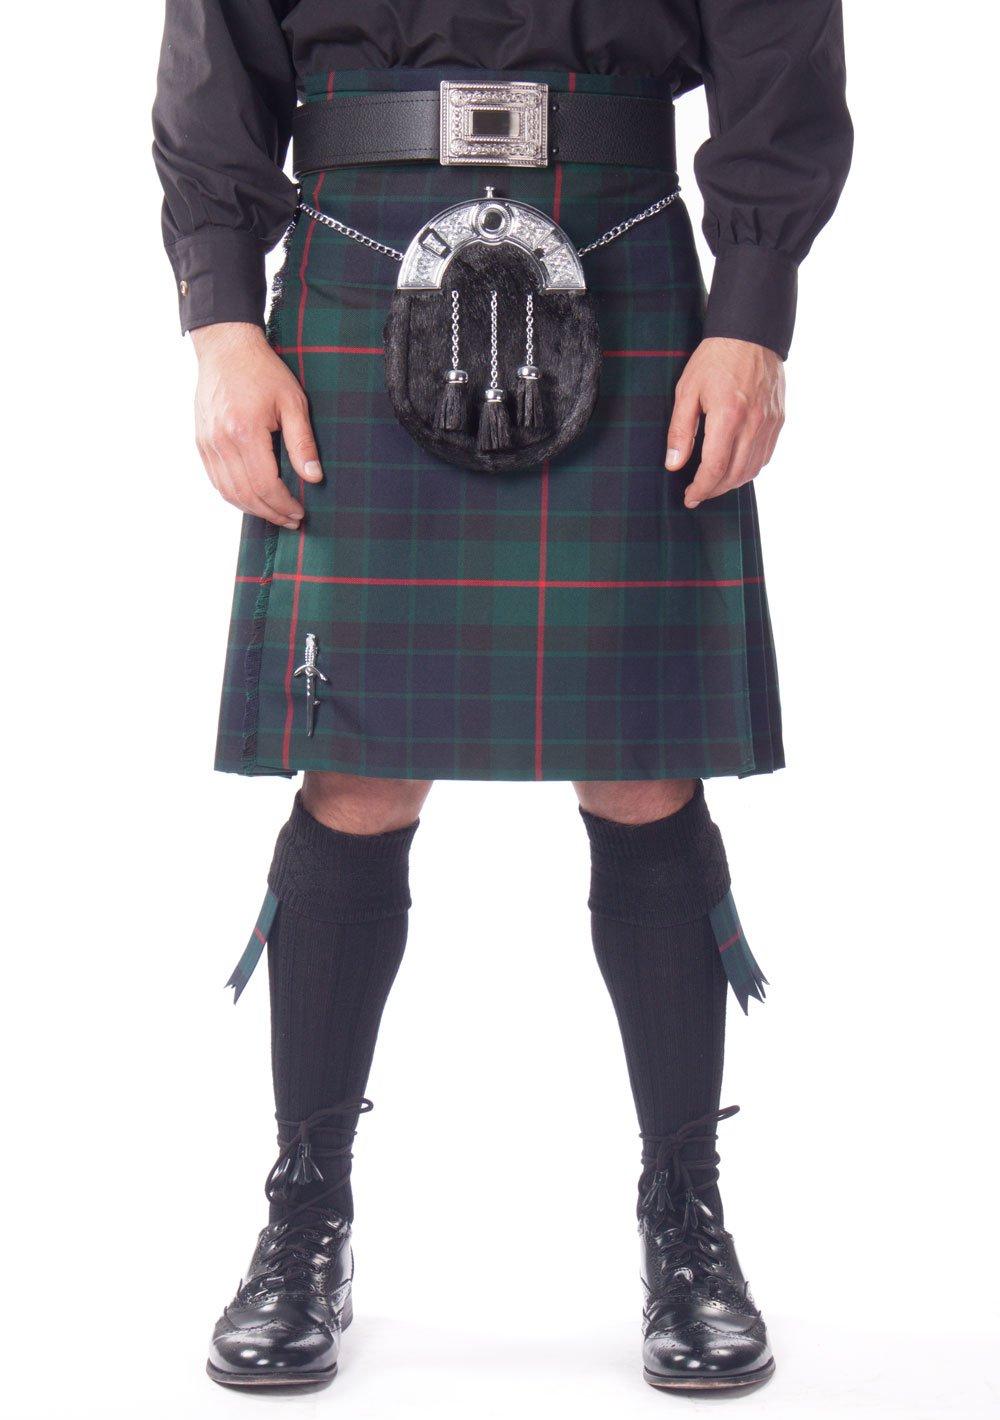 Kilt Society Mens 7 Piece Full Dress Kilt Outfit- Gunn Tartan with Black Hose 46'' to 50''